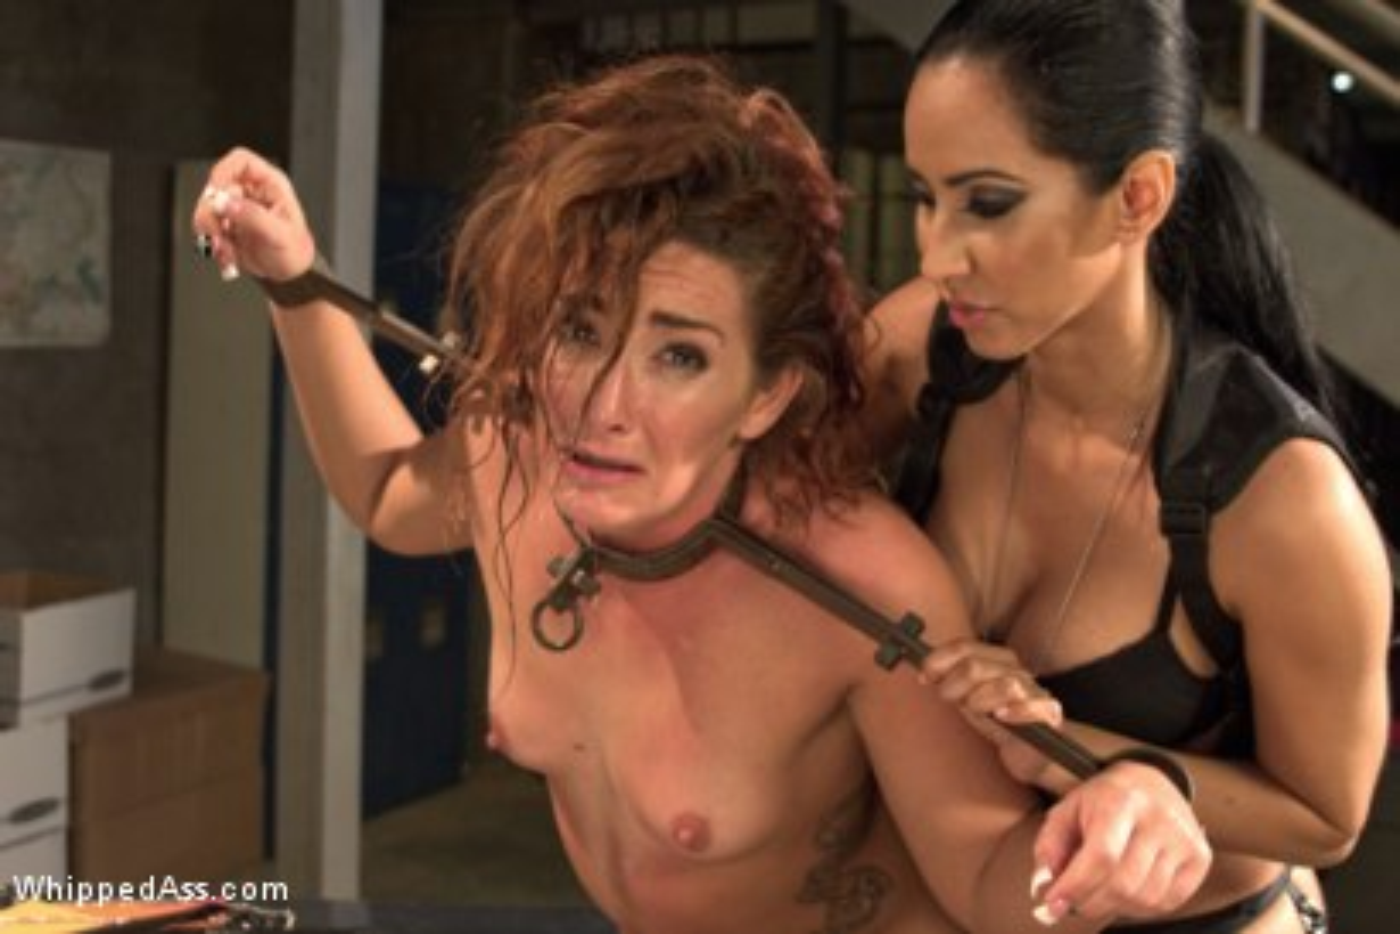 Lesbian prison gangbang have faced